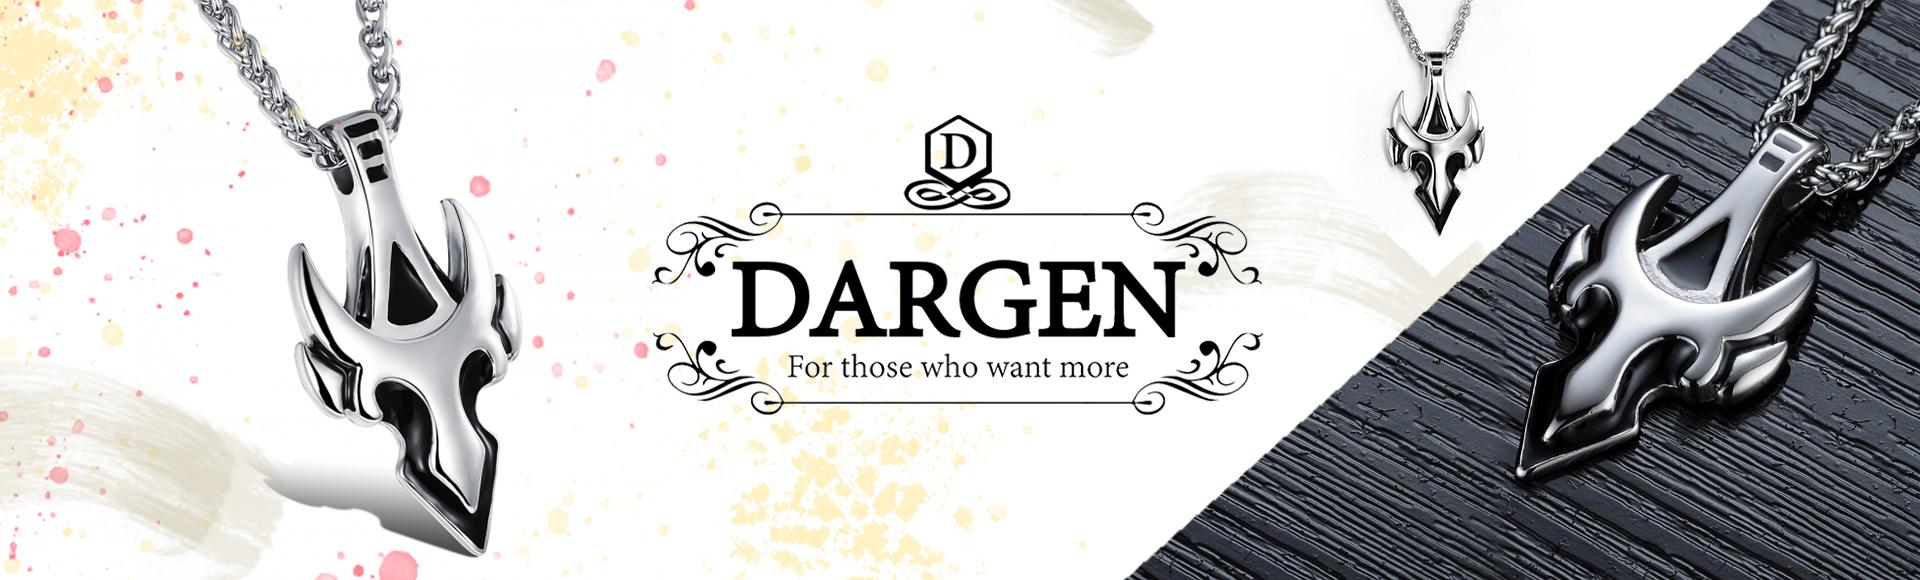 Dargen - Accesorii Barbati